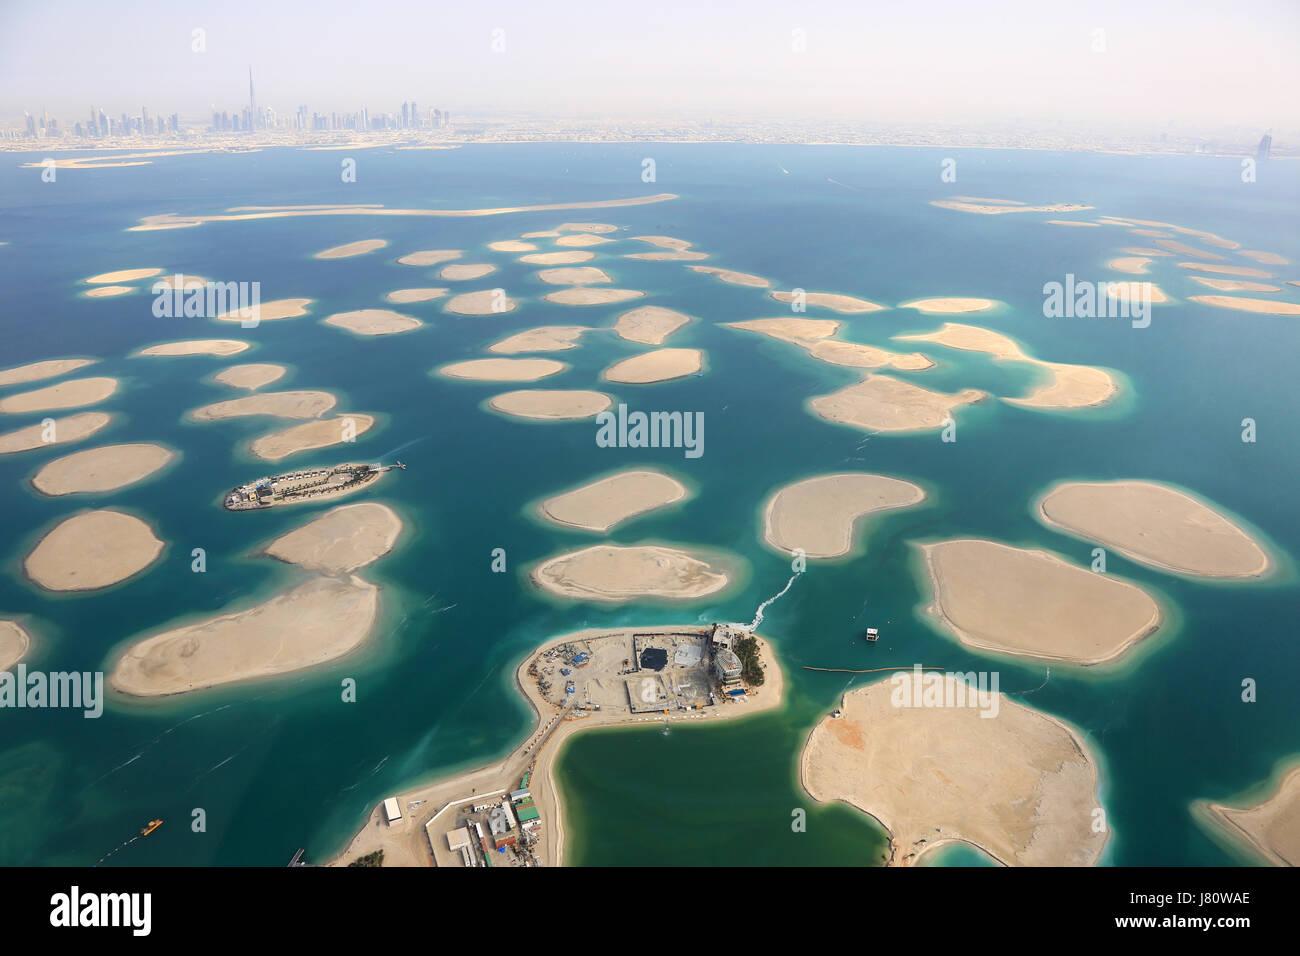 Dubai The World Islands Island panorama aerial view photography UAE - Stock Image